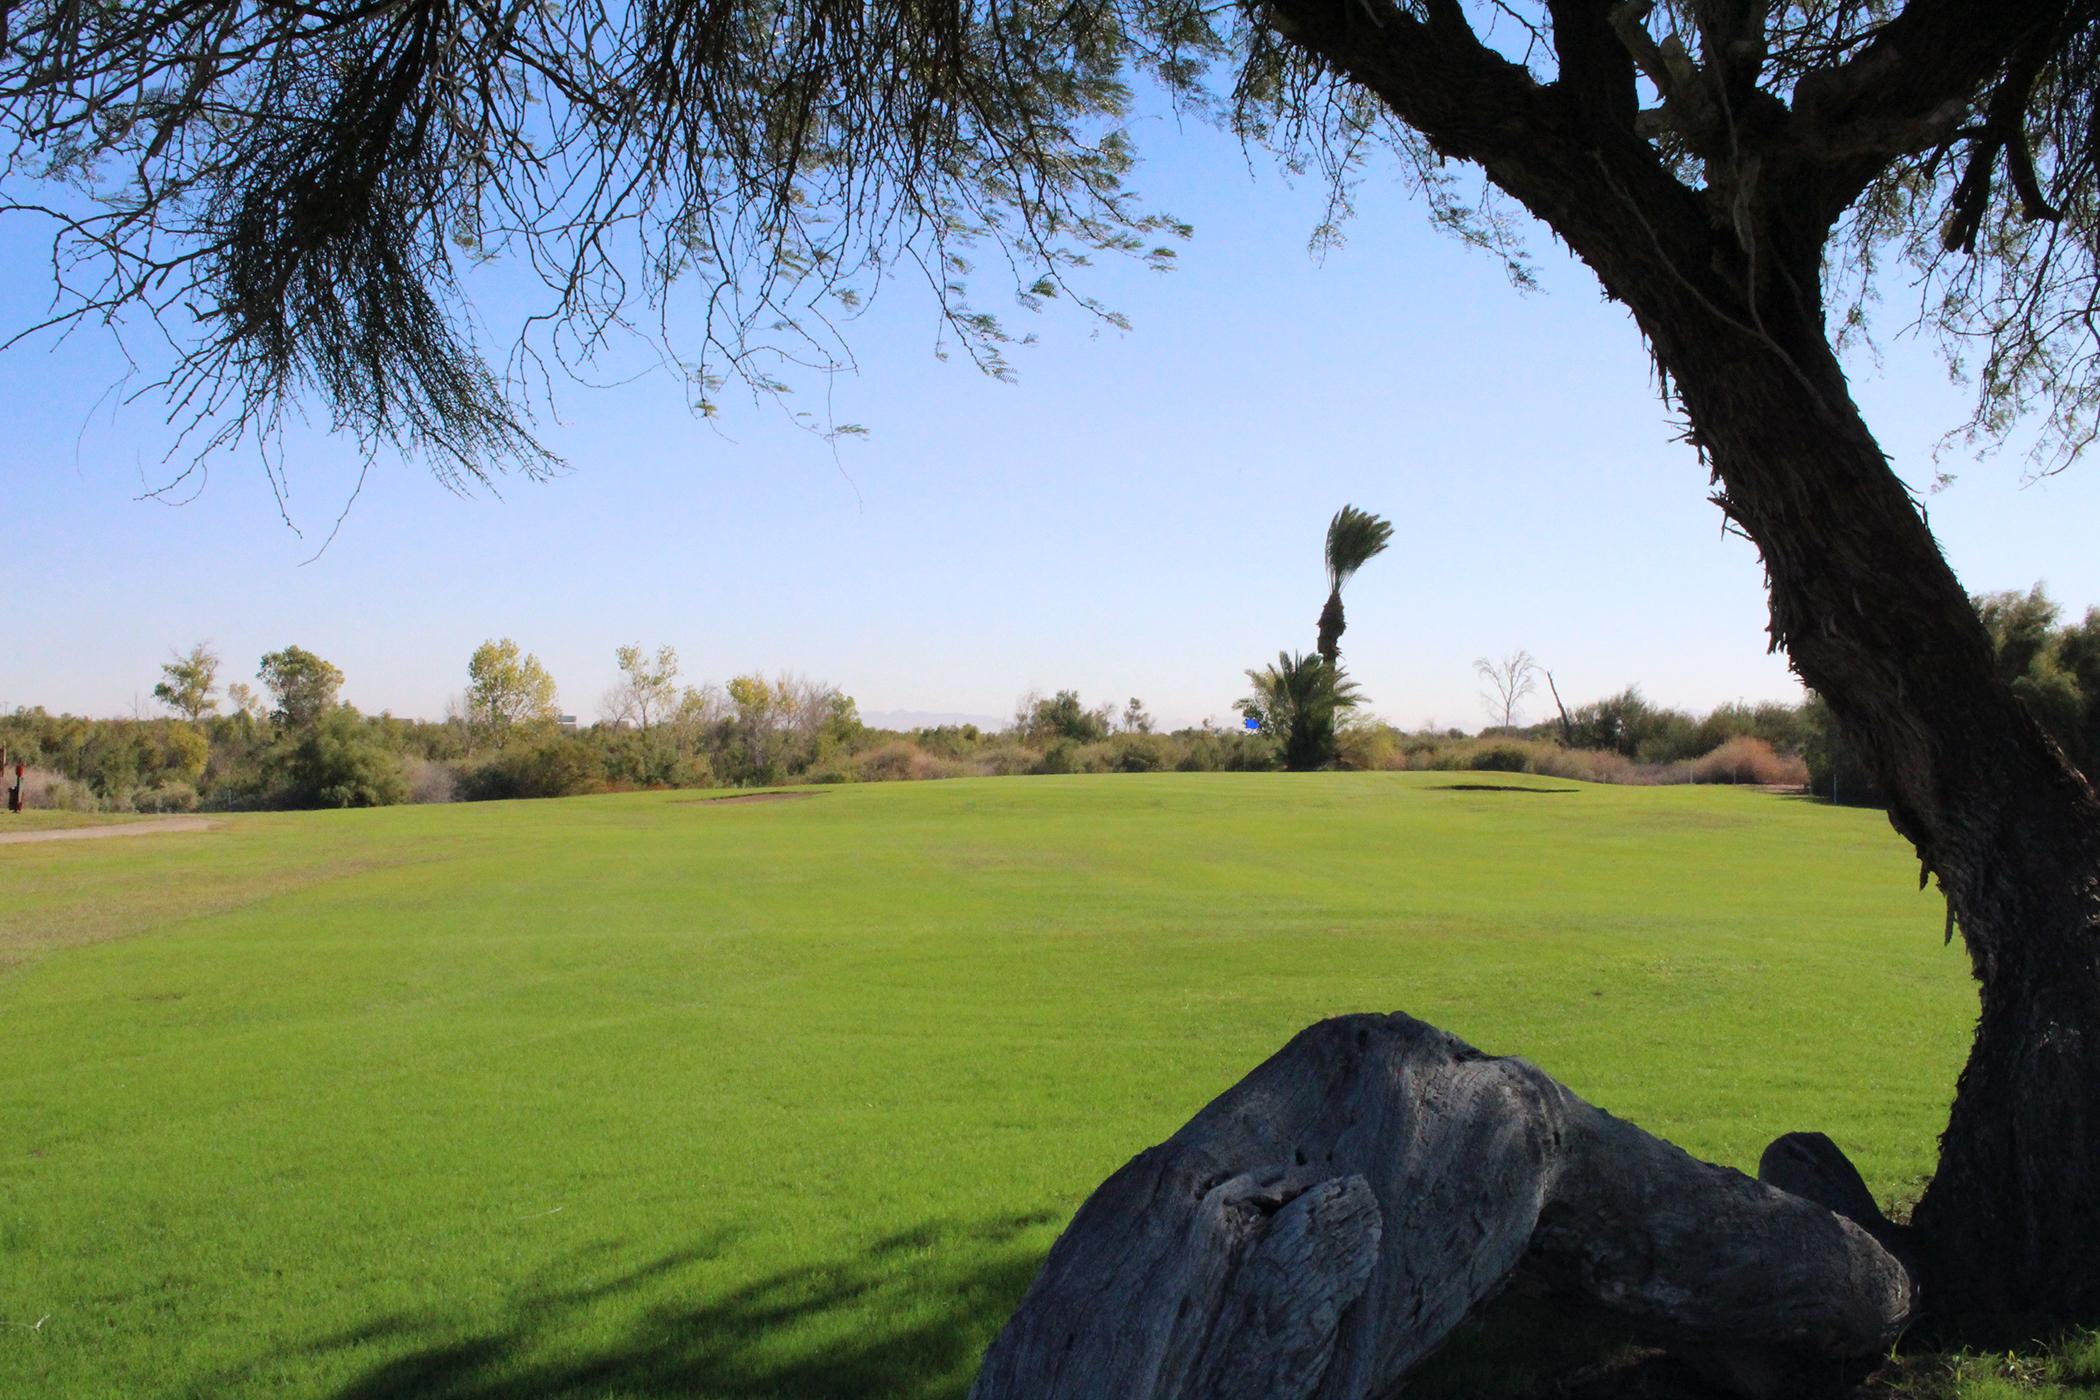 Golf - Cocopah RV and Golf Resort